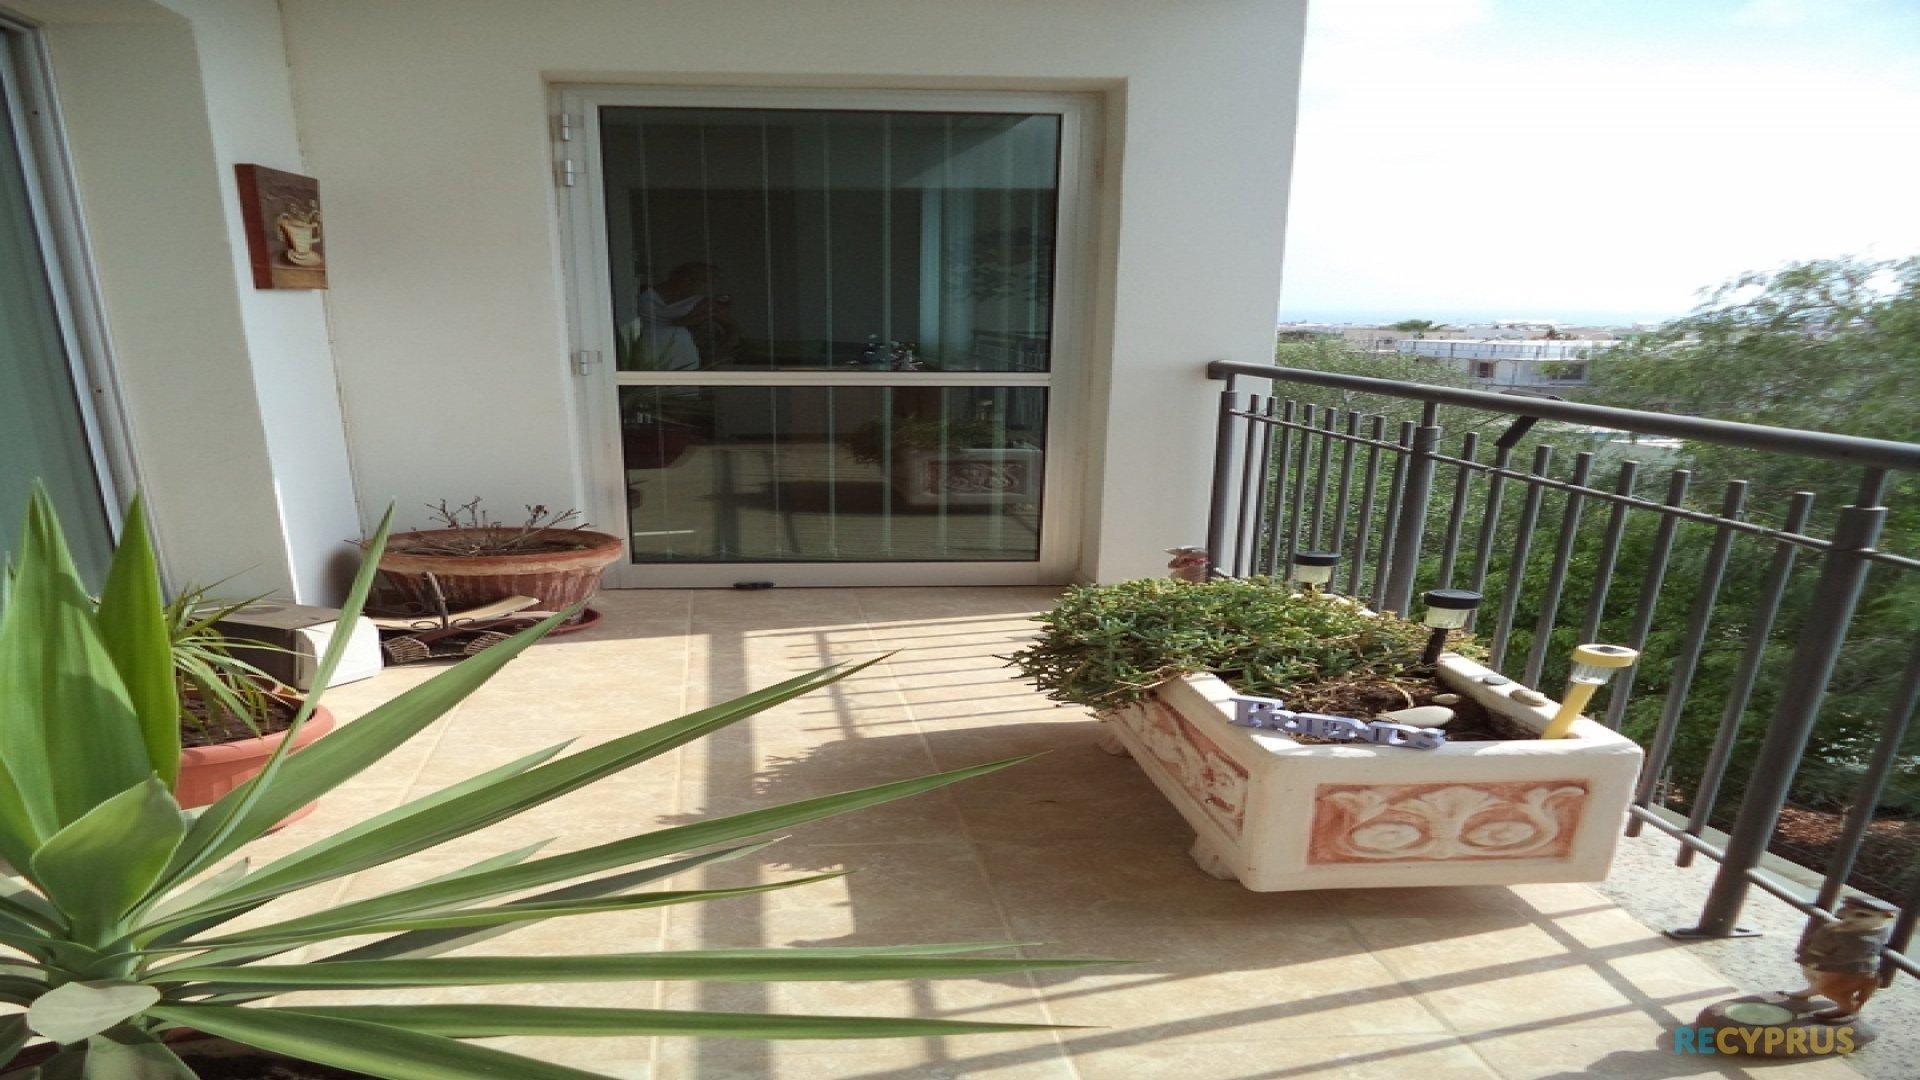 Apartment for sale Kapparis Famagusta Cyprus 12 3463